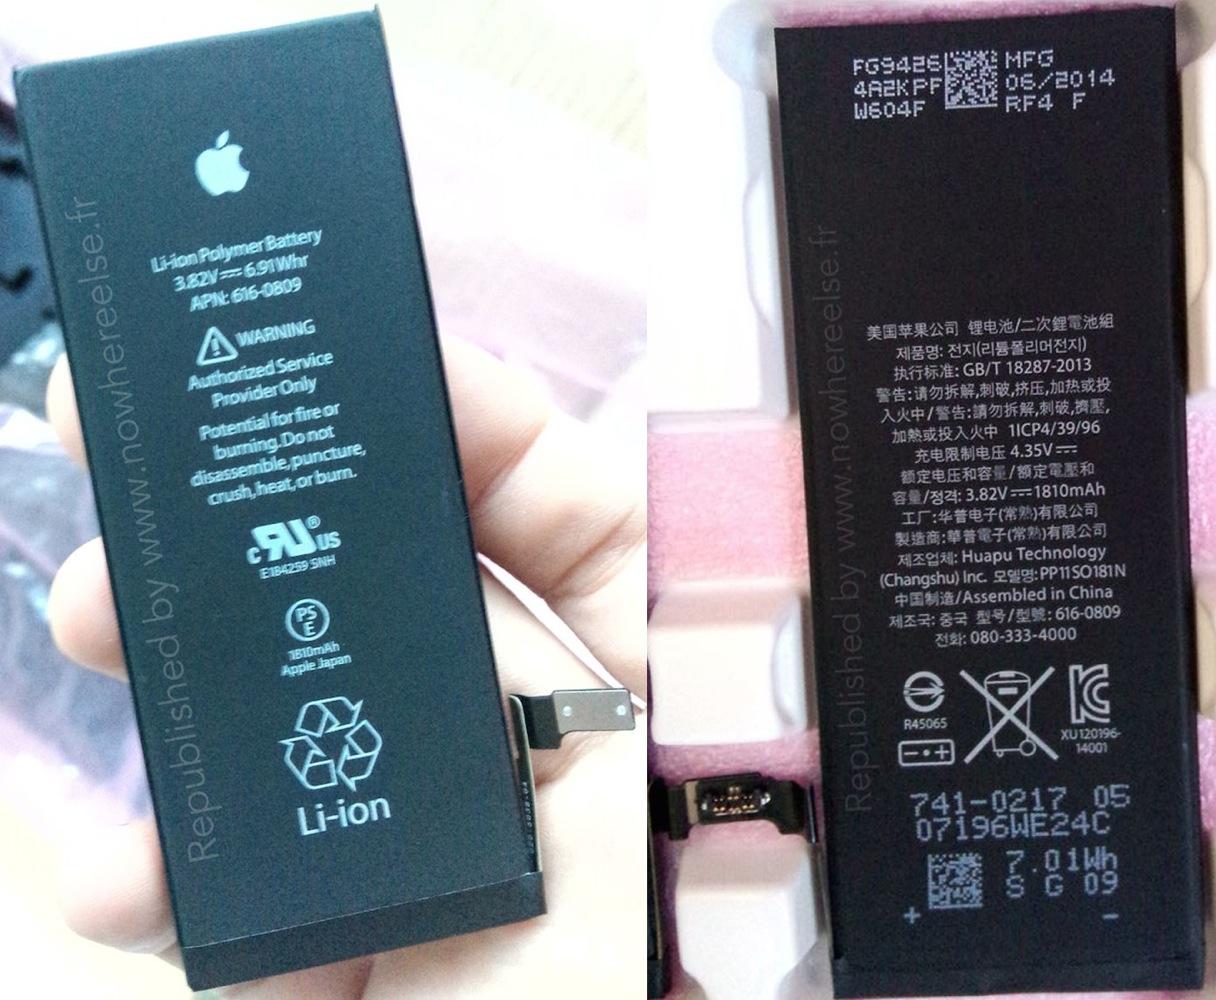 Point toward 1 810 mah battery for 4 7 inch iphone 6 mac rumors